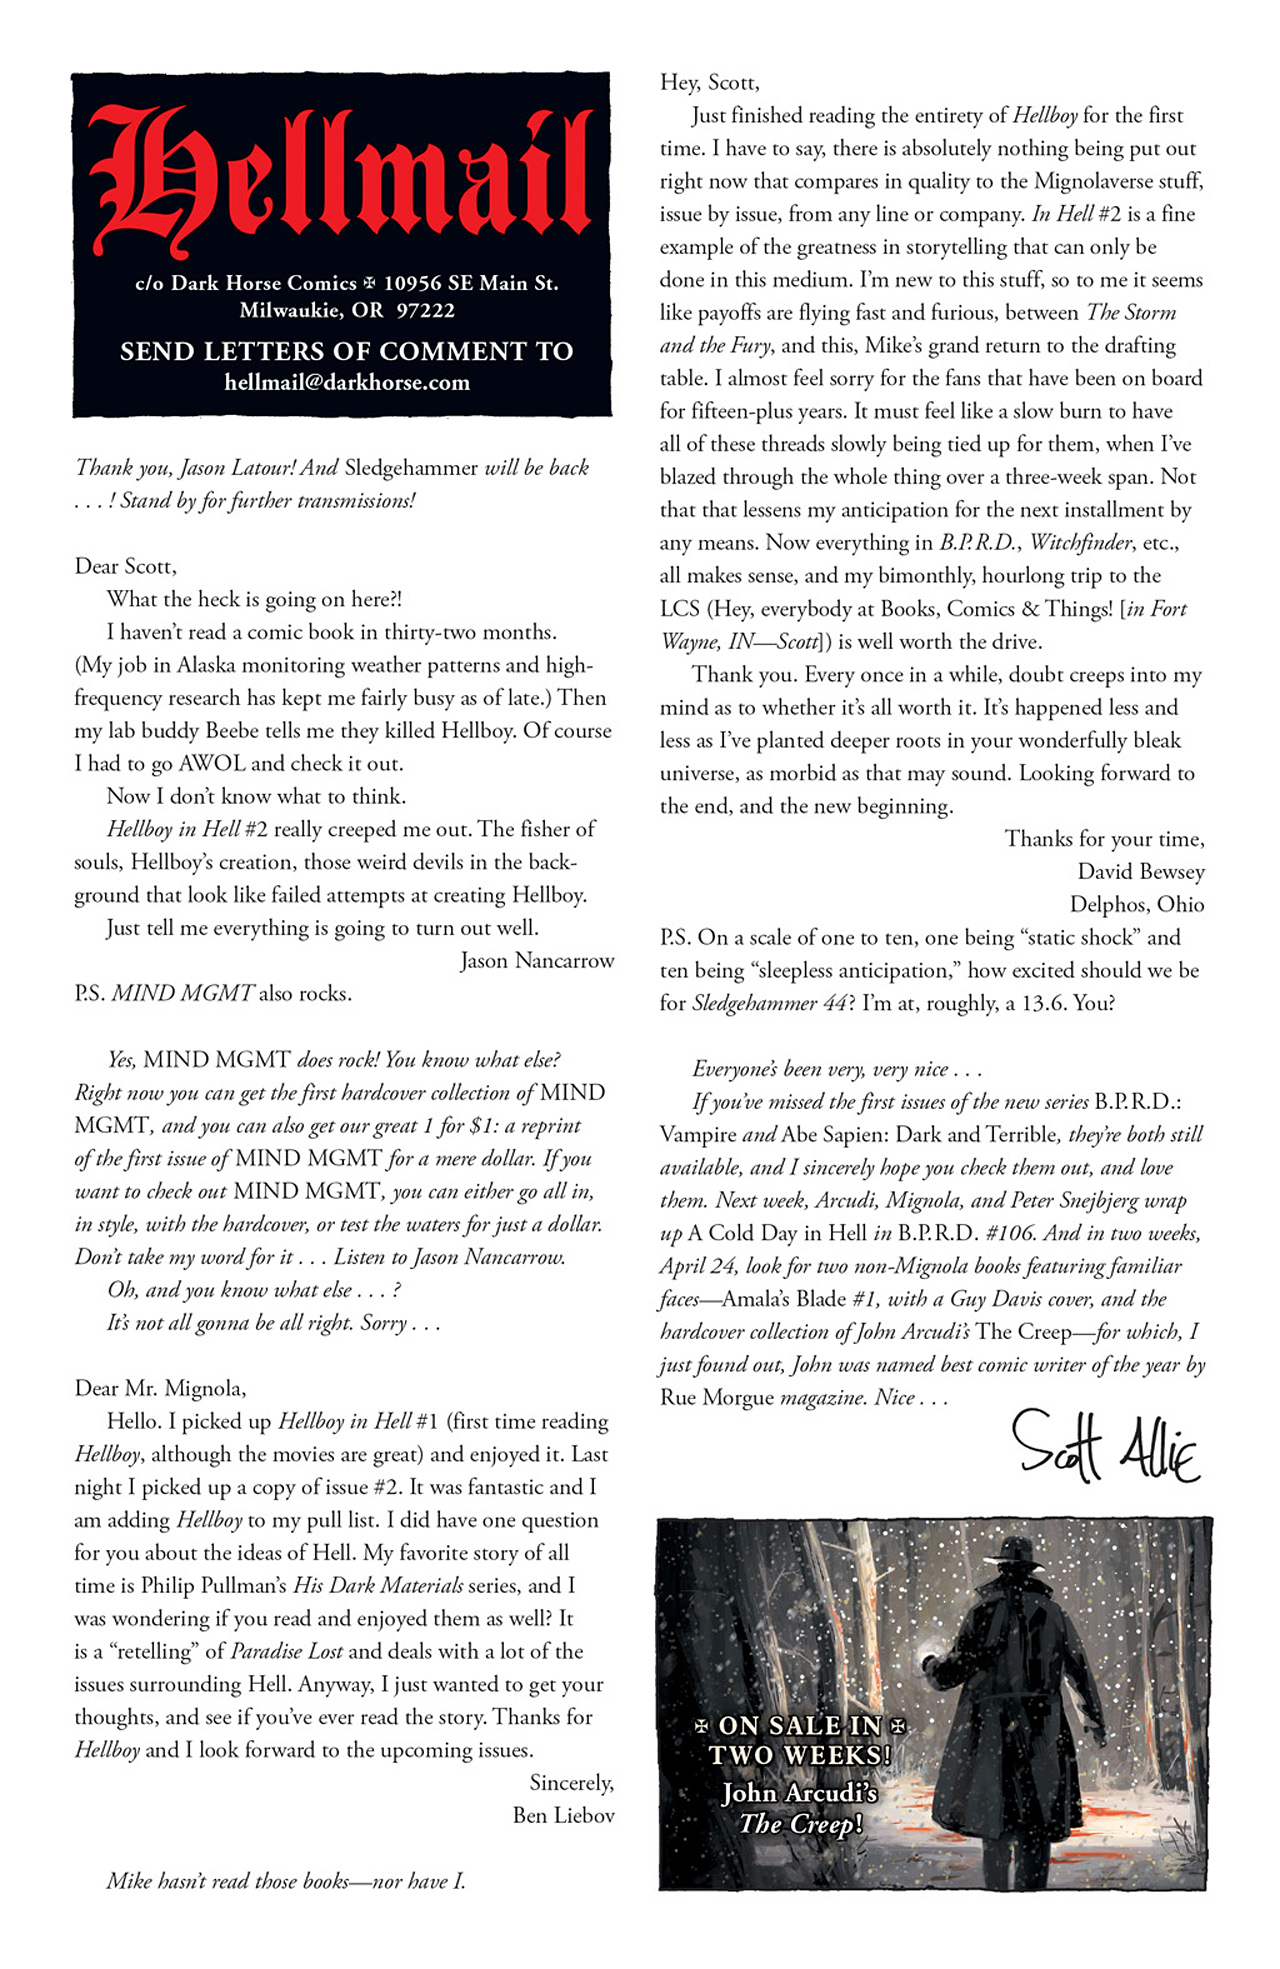 Read online Sledgehammer 44 comic -  Issue #2 - 25